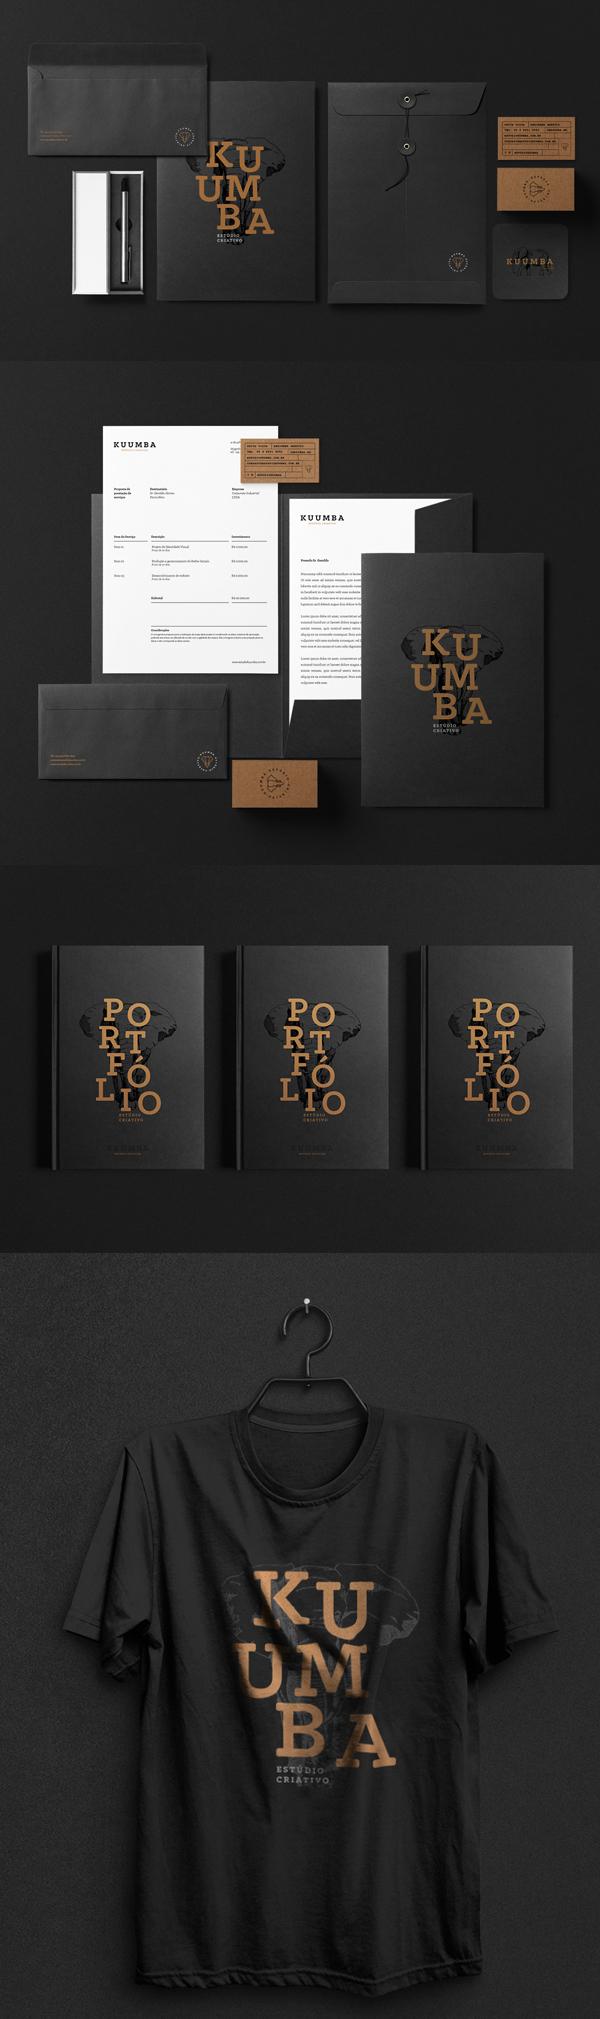 Stationery - Estúdio Kuumba   Brand Identity by David Silva